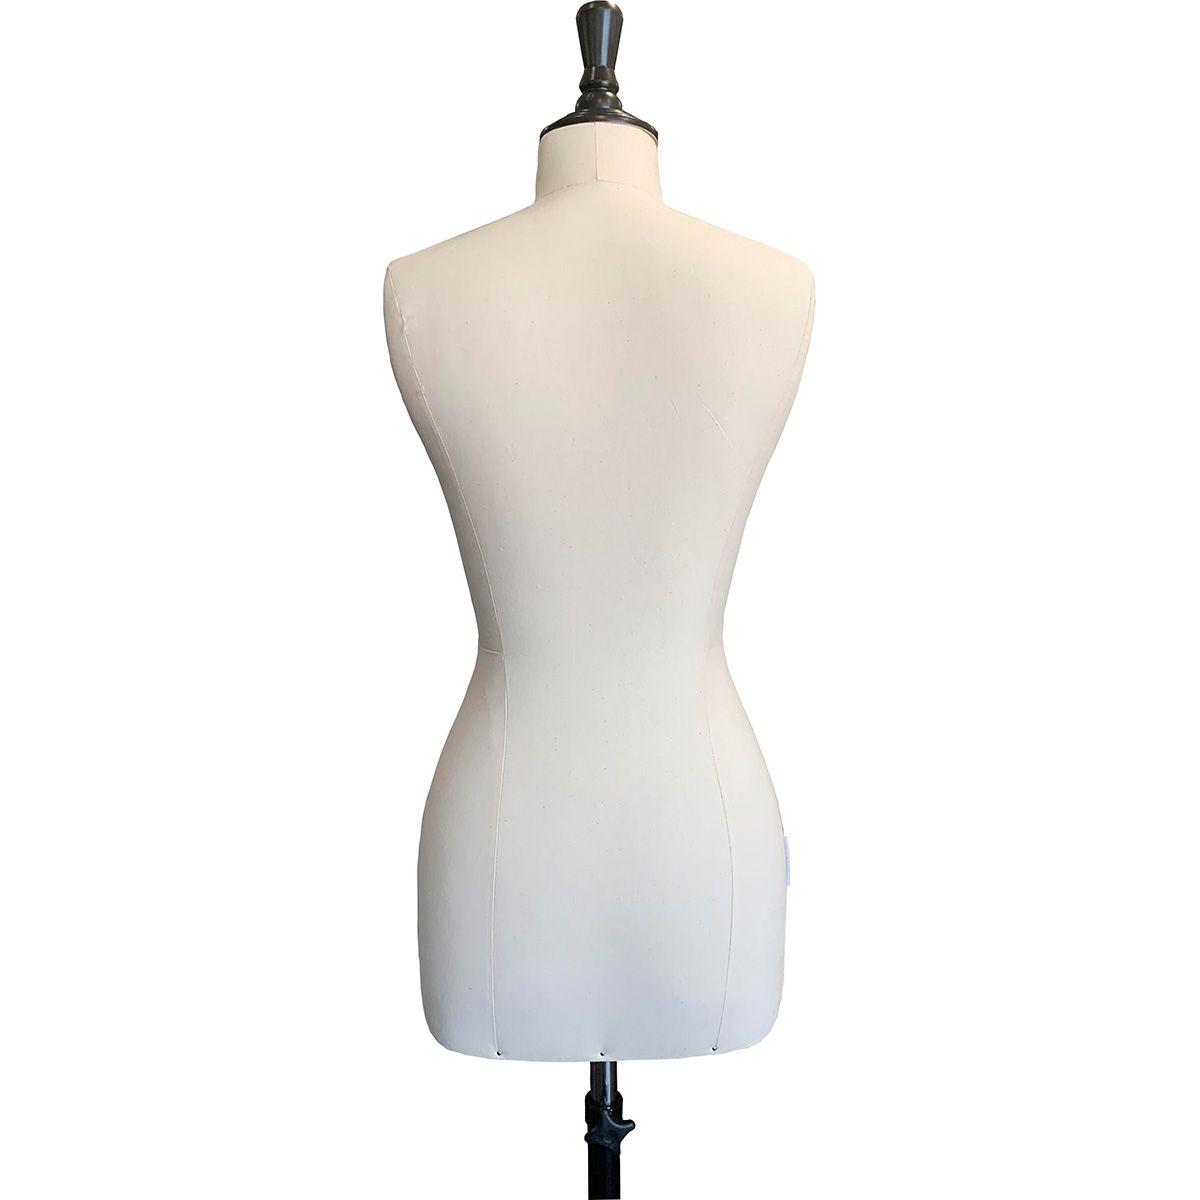 Mannequin de modélisme de mode Rascol taille 38